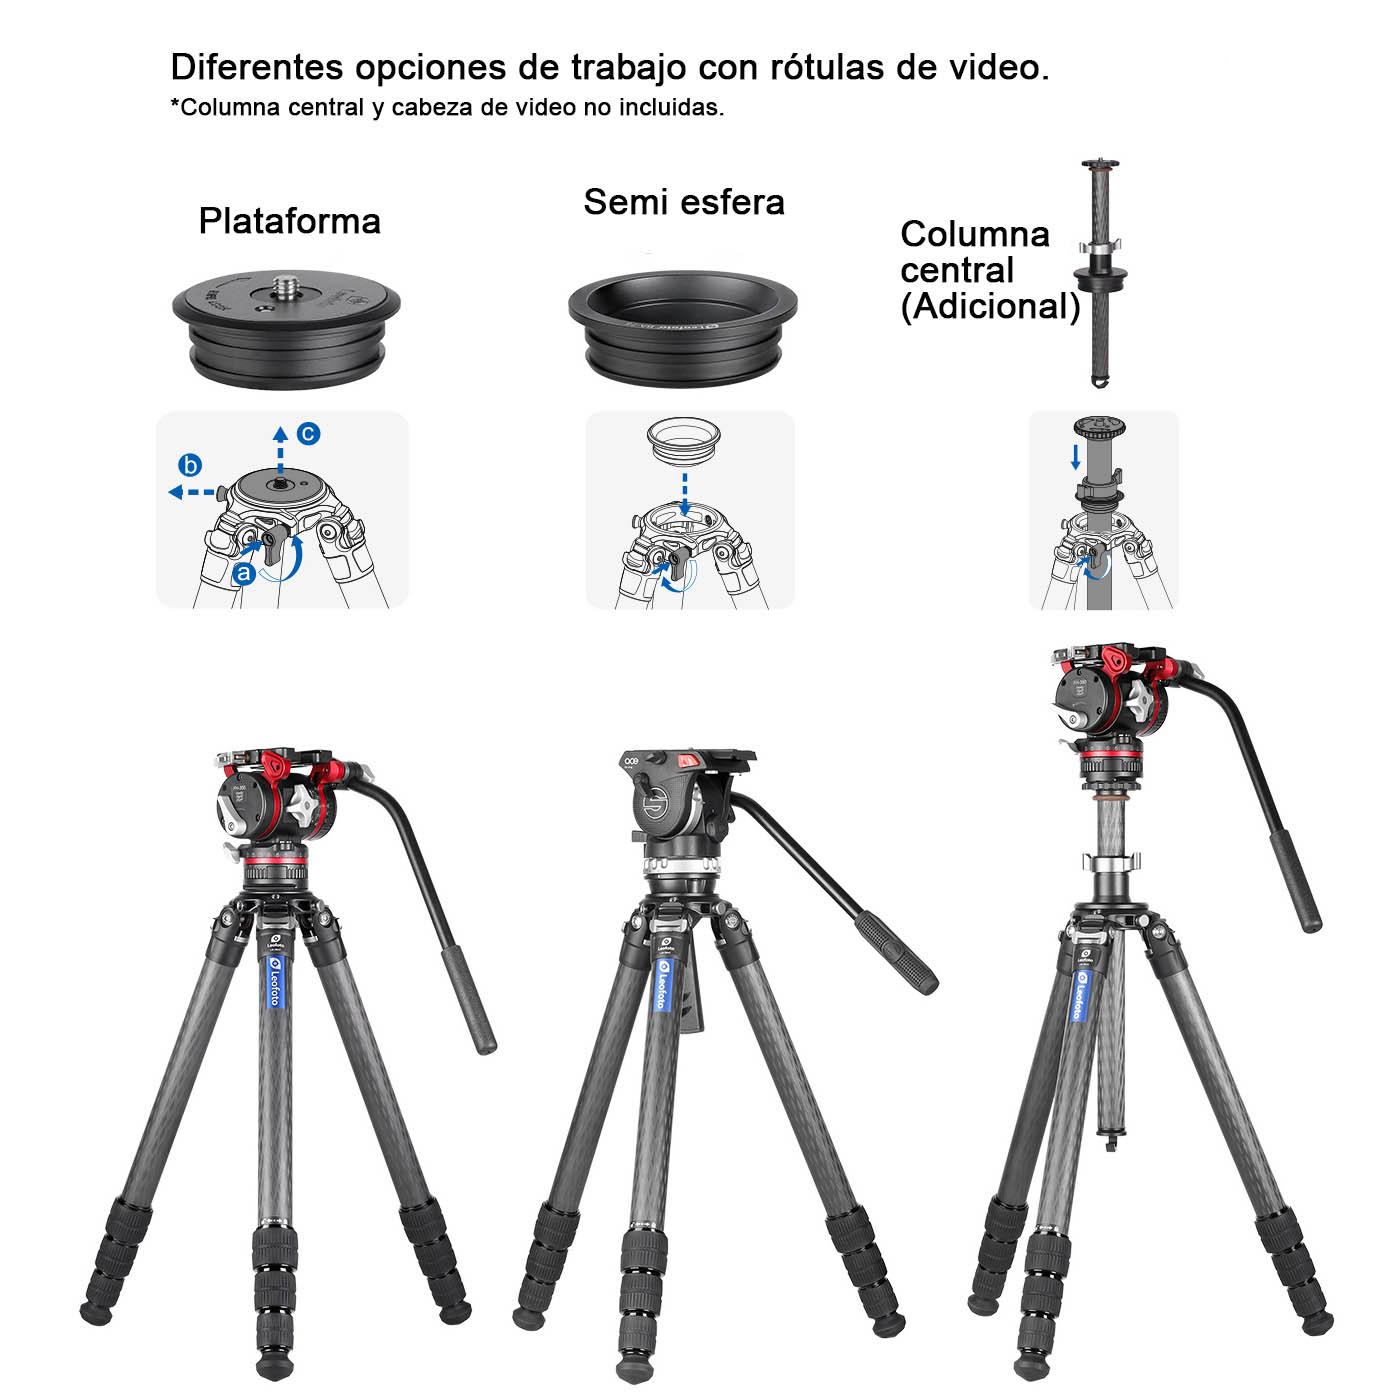 LM-364C Summit trípode Leofoto sin columna para video cámaras